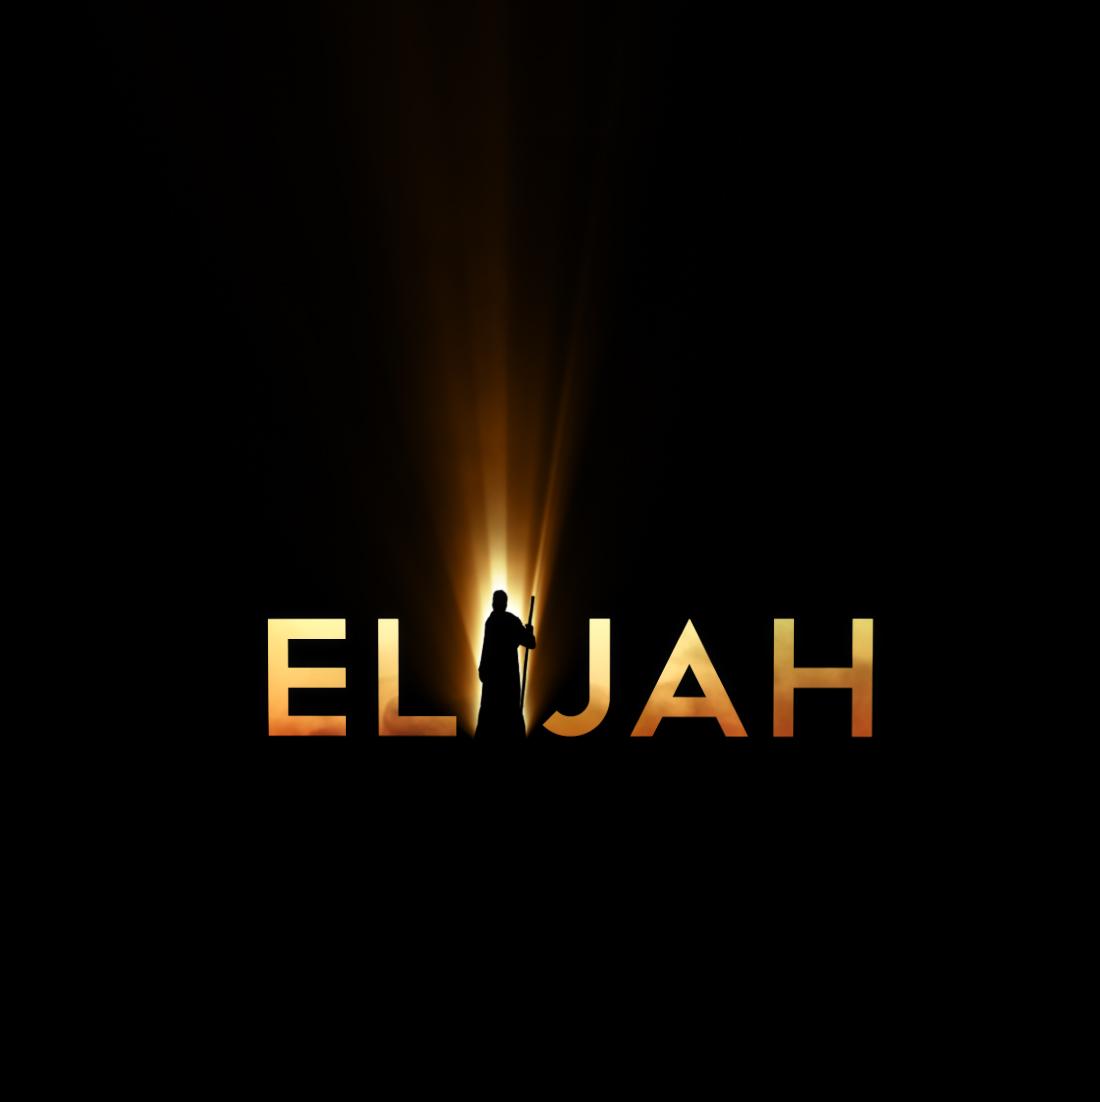 elijah-logo.jpg